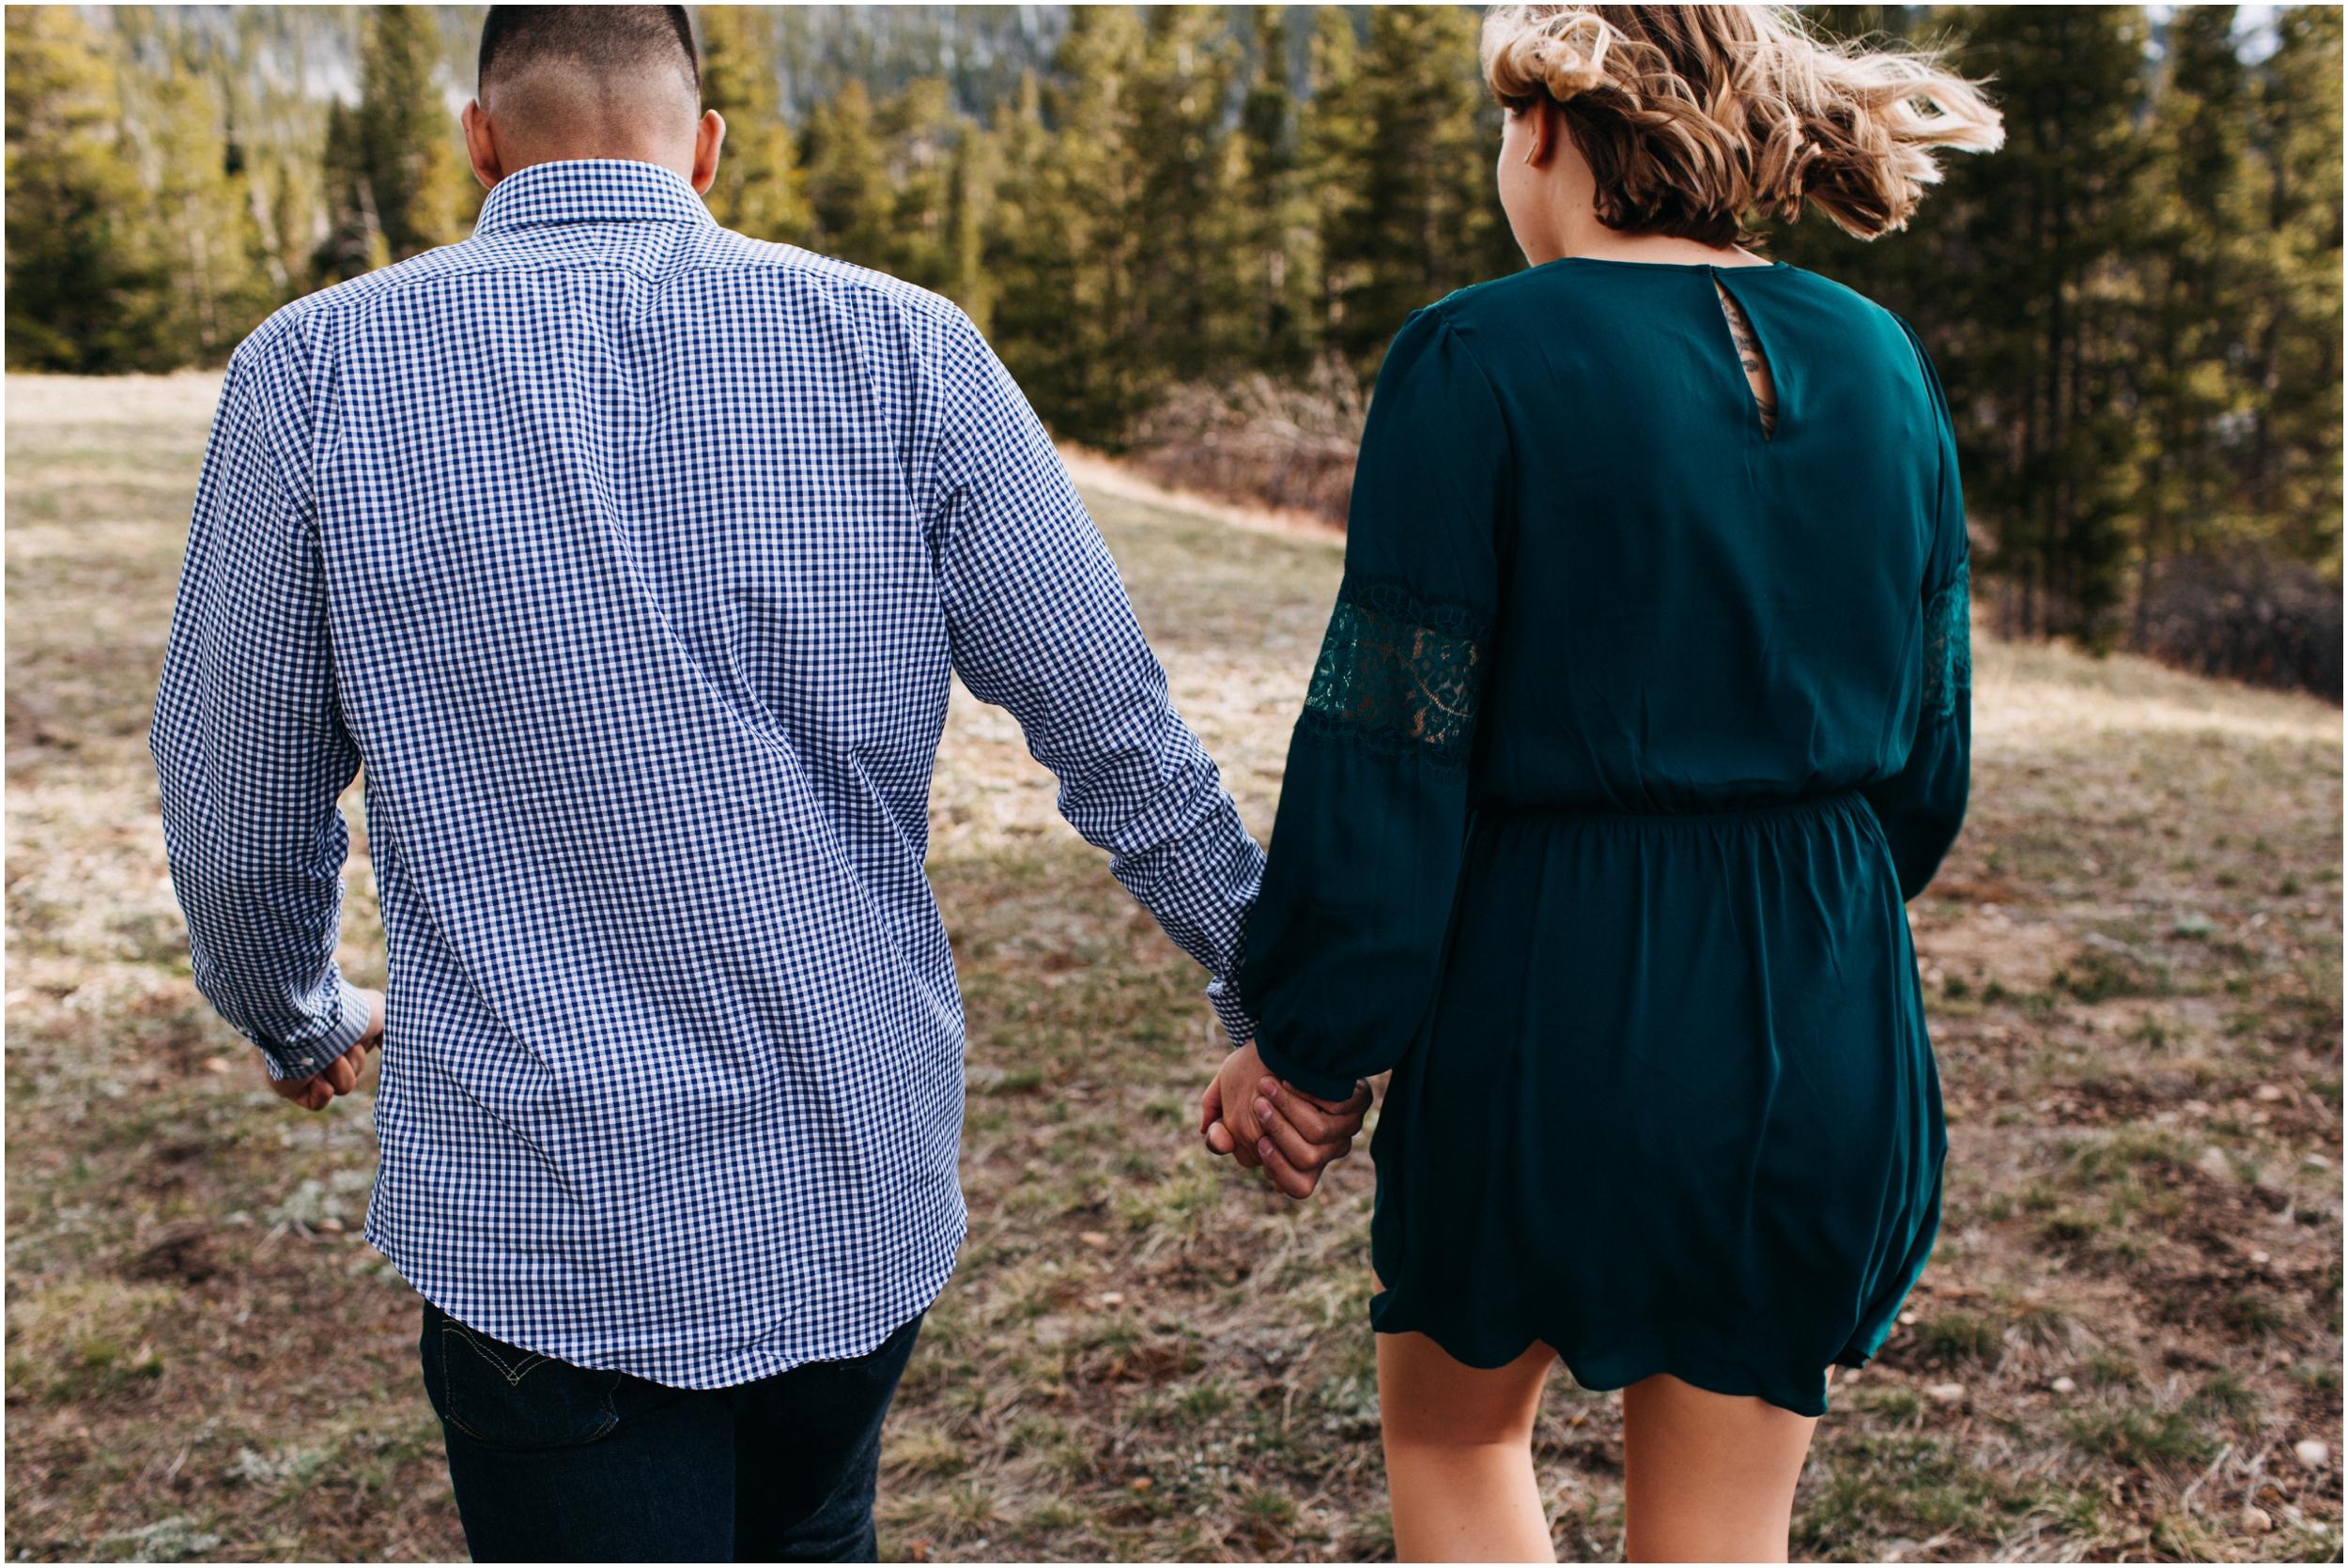 rocky-mountain-national-park-elopement-sprague-lake-colorado-adventure-wedding-photographer_taylor-powers_47.jpg